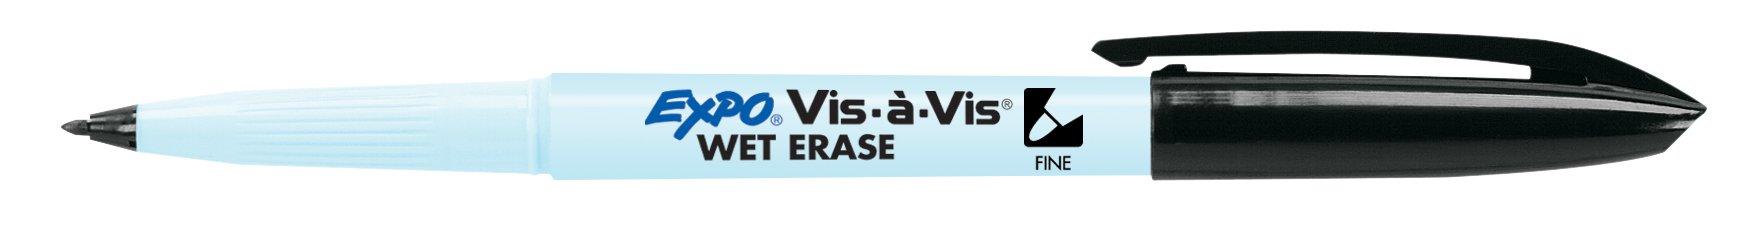 EXvis-a-visBlackFine.xmp